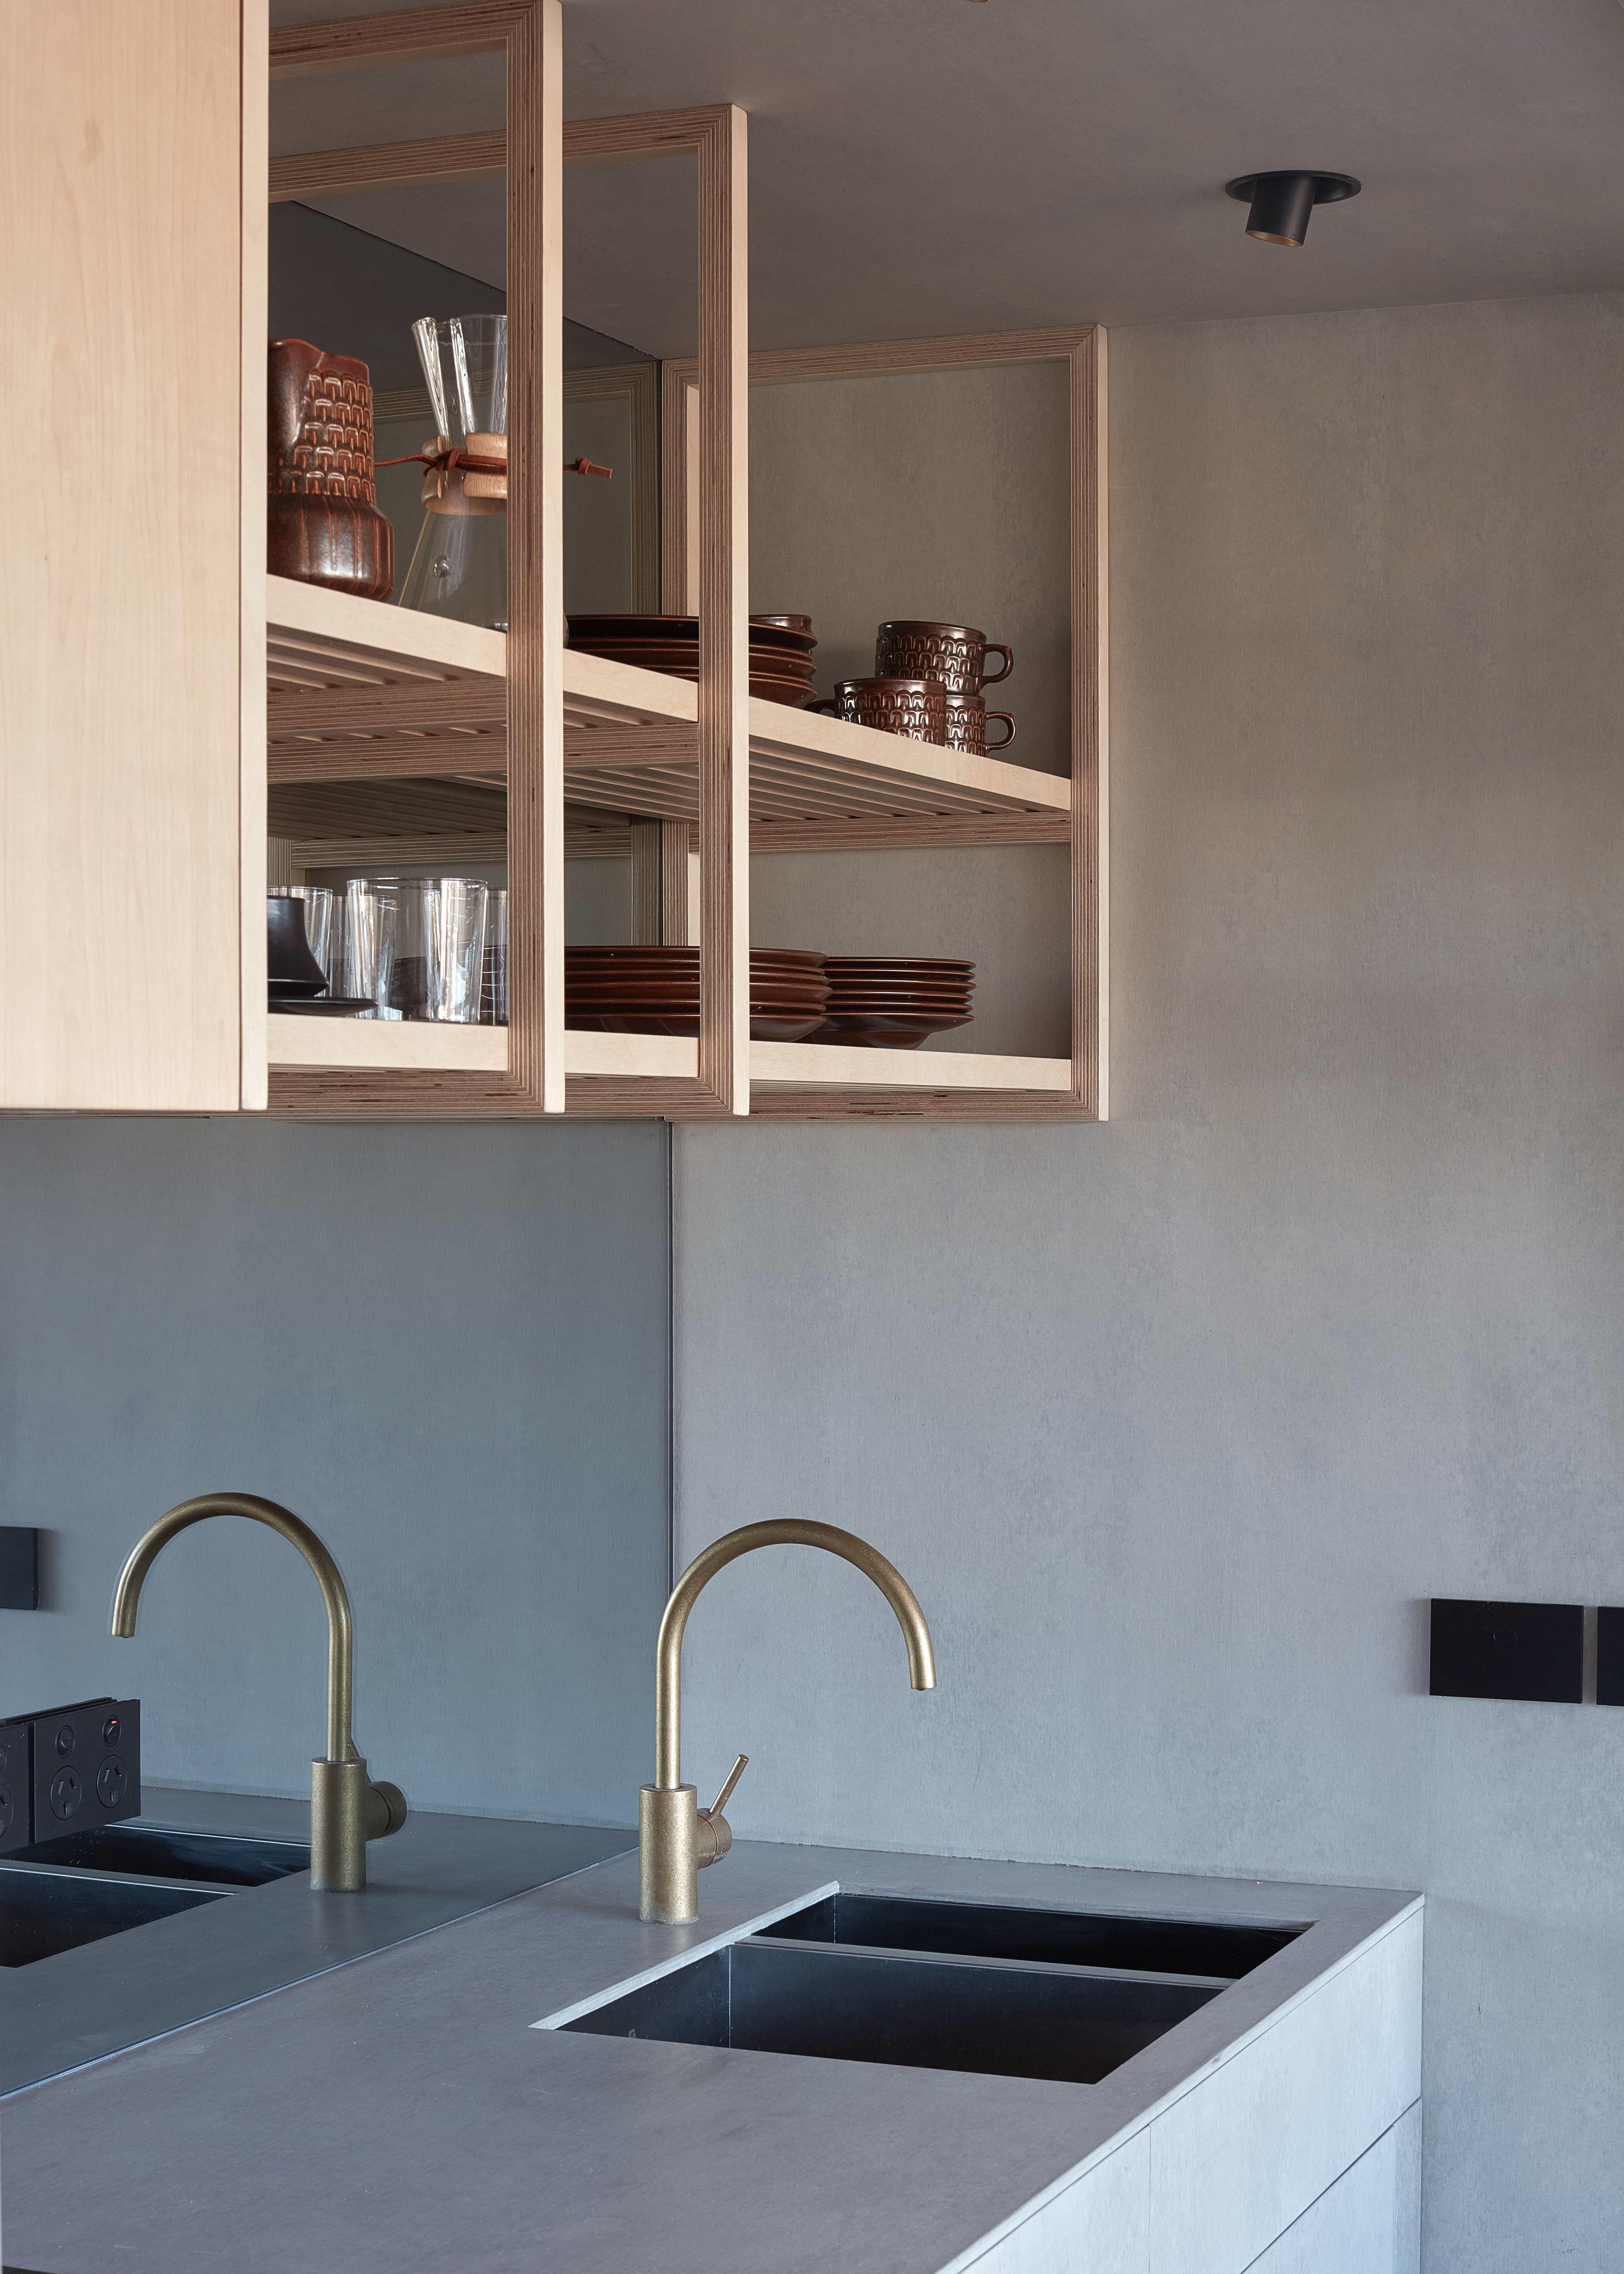 Gallery Of #thebaetas By Liz Walsh & Alex Nielsen Local Australian Residential Architecture & Interior Design Sandy Bay, Tas Image 11